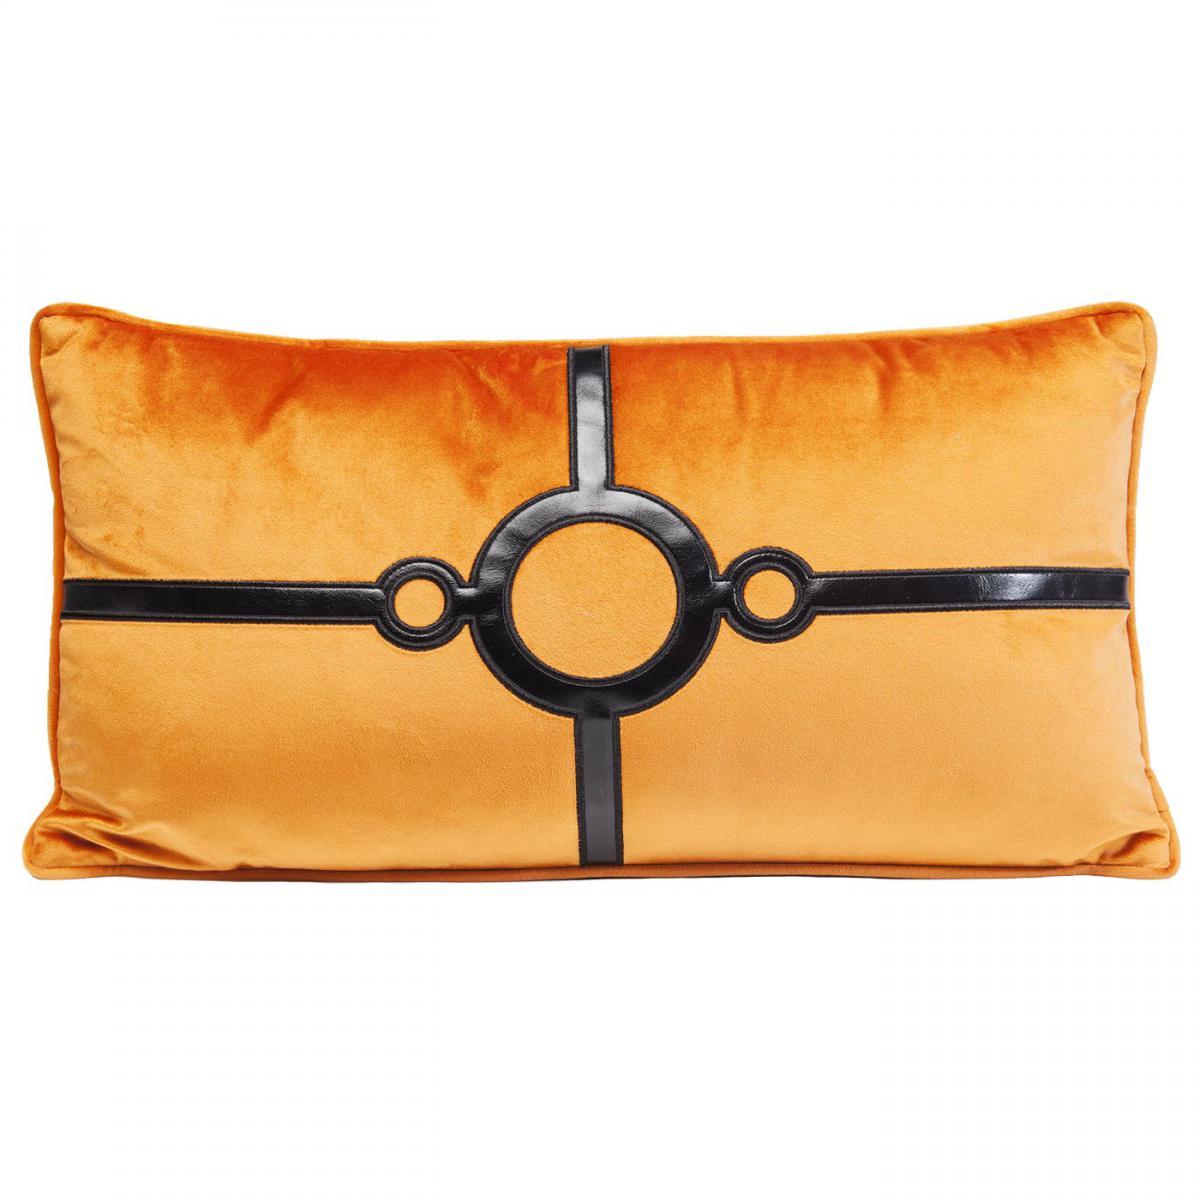 Karedesign Coussin orange Classy Circles 28x50cm Kare Design